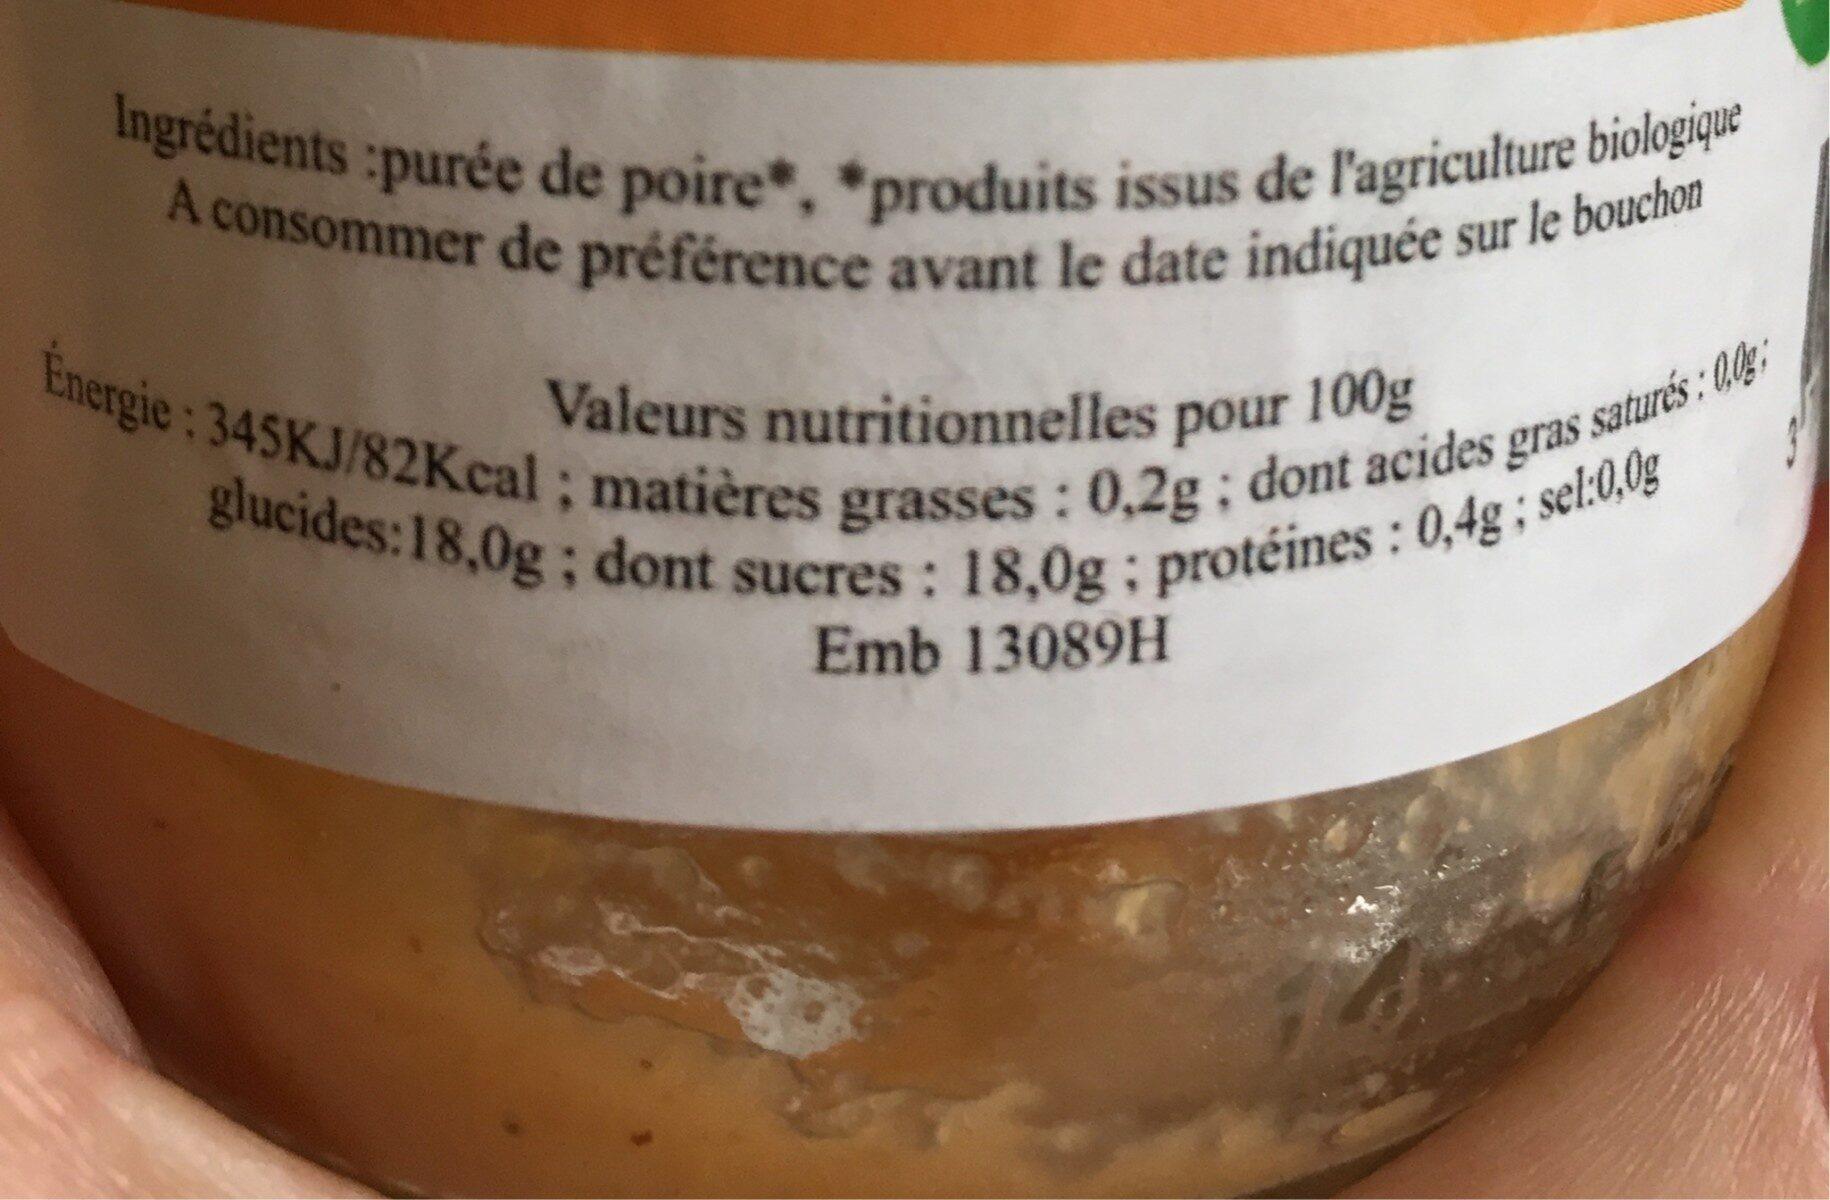 Puree de poire bio - Ingredients - fr